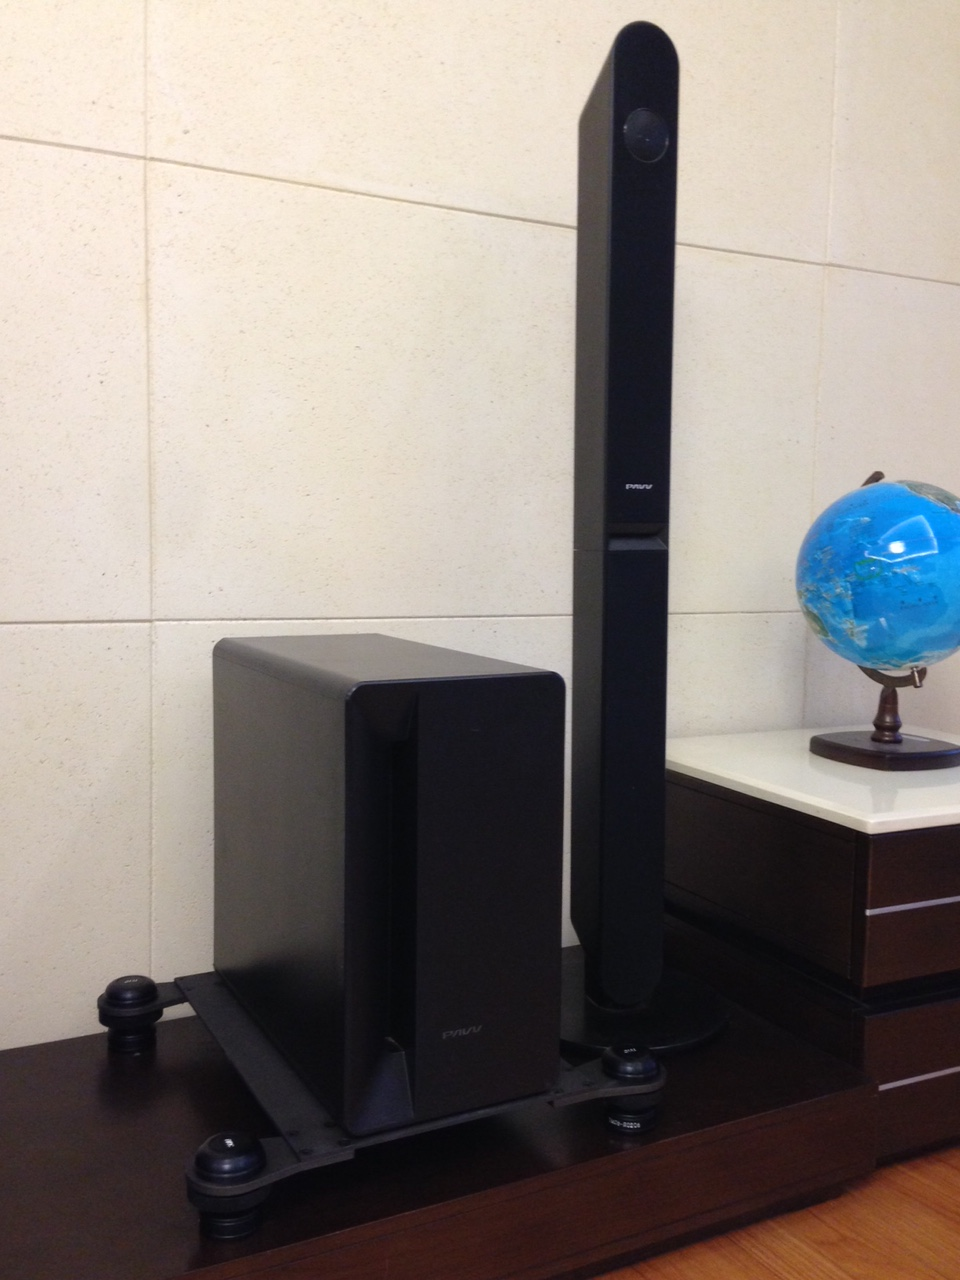 CTM3045-Coil spring vibration isolation platform for Audio Sound Speaker,anti vibration platform